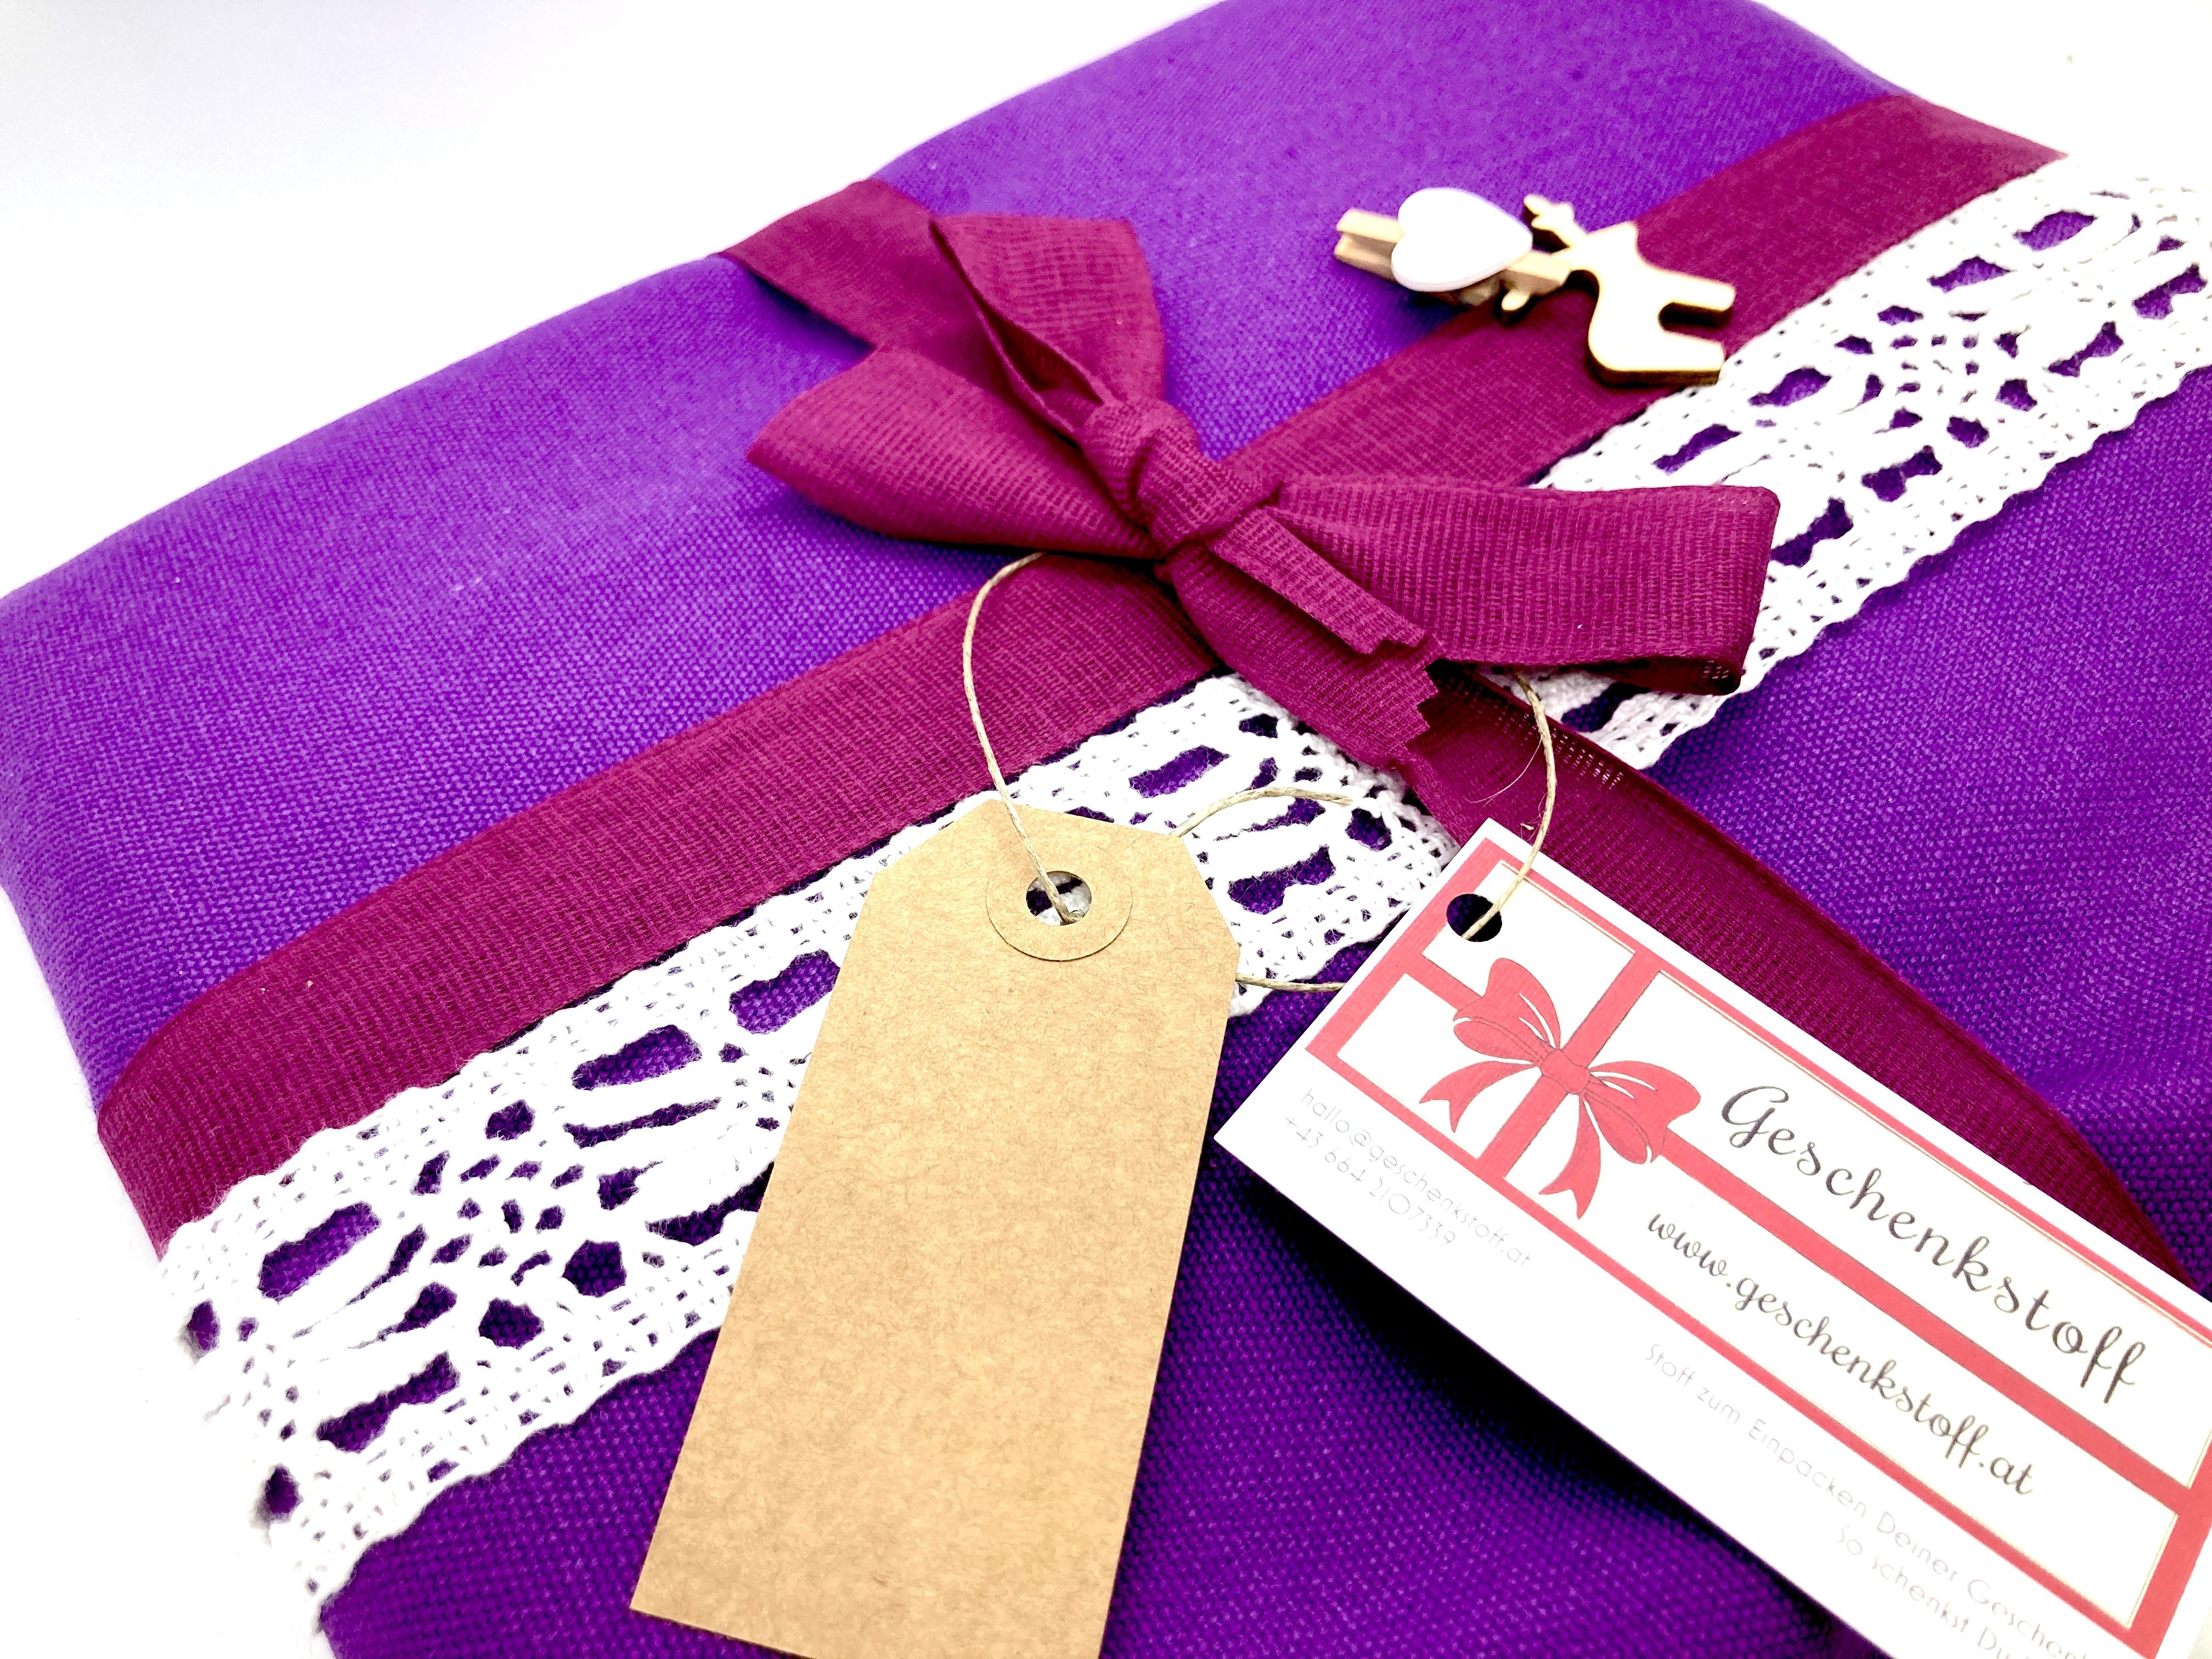 Advent: Violett ist nett (70x50cm, 100x80cm)